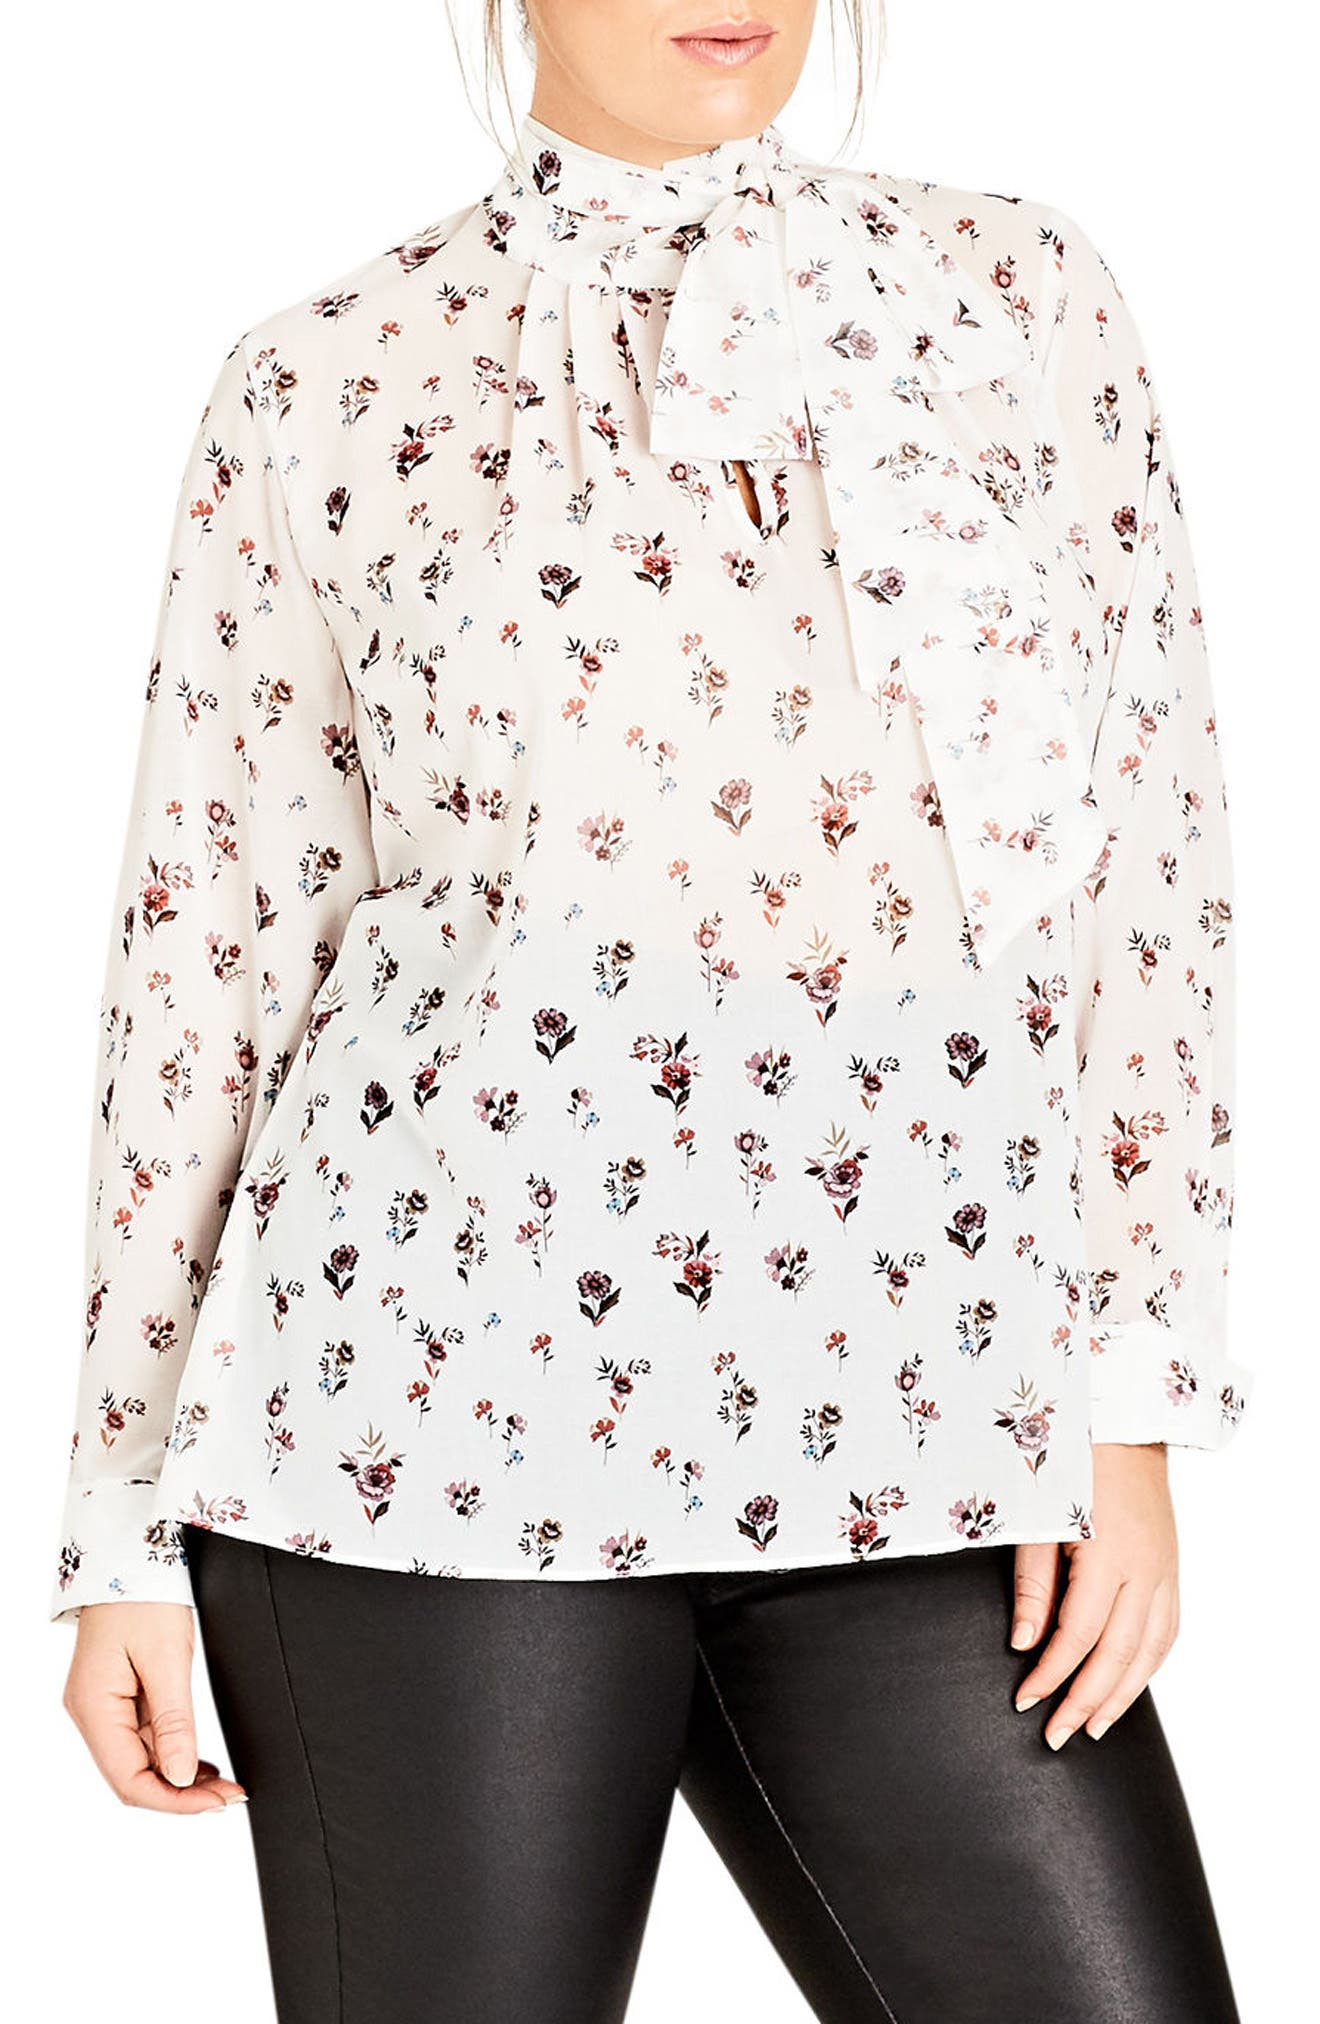 Alternate Image 1 Selected - City Chic Flower Rain Tie Neck Top (Plus Size)